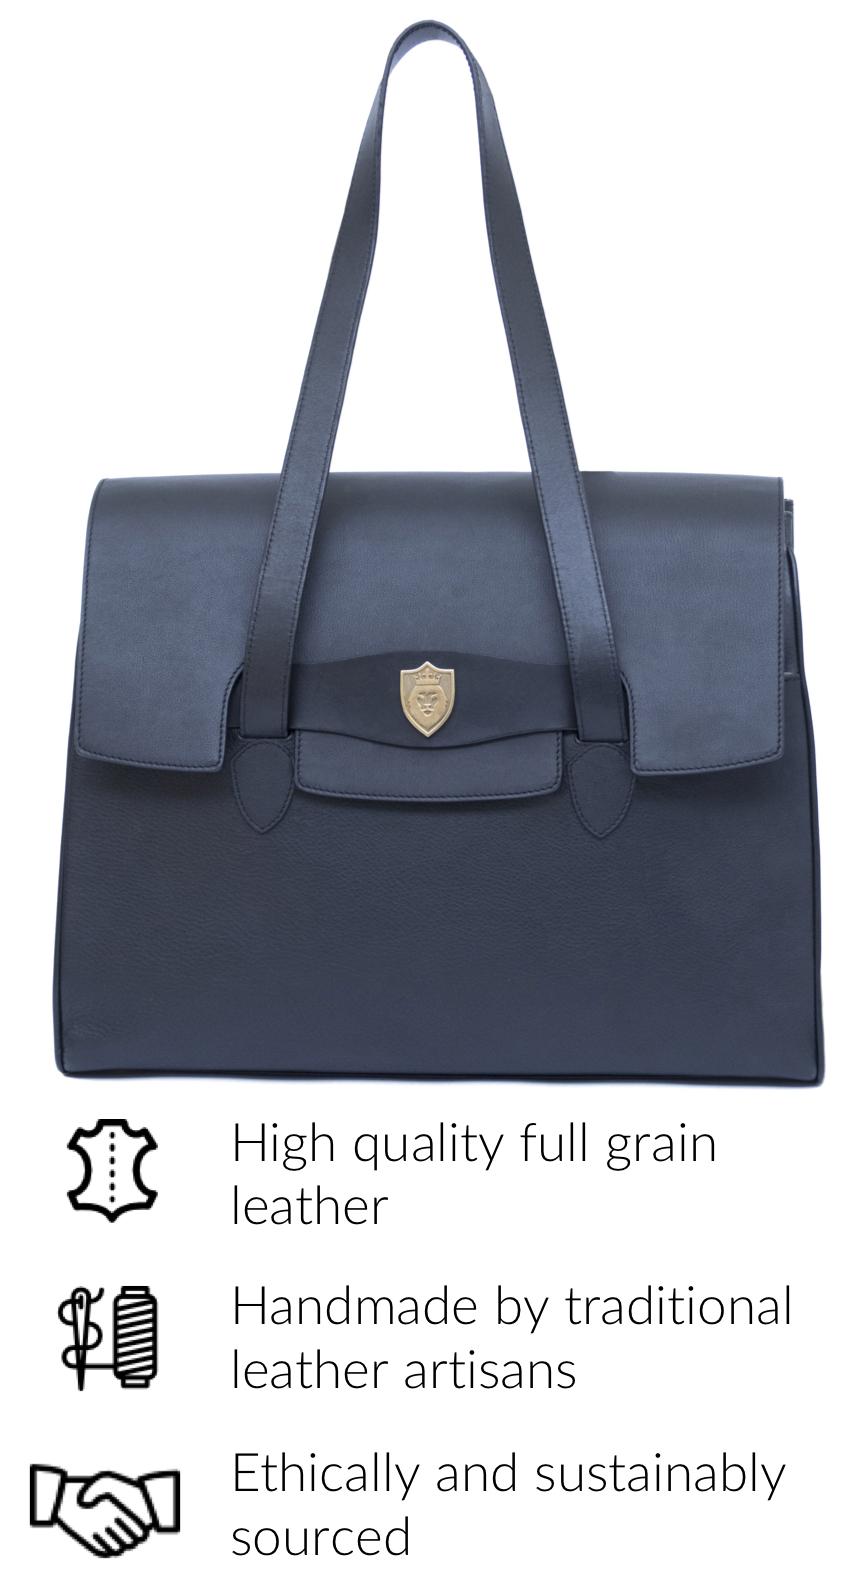 Handbag view